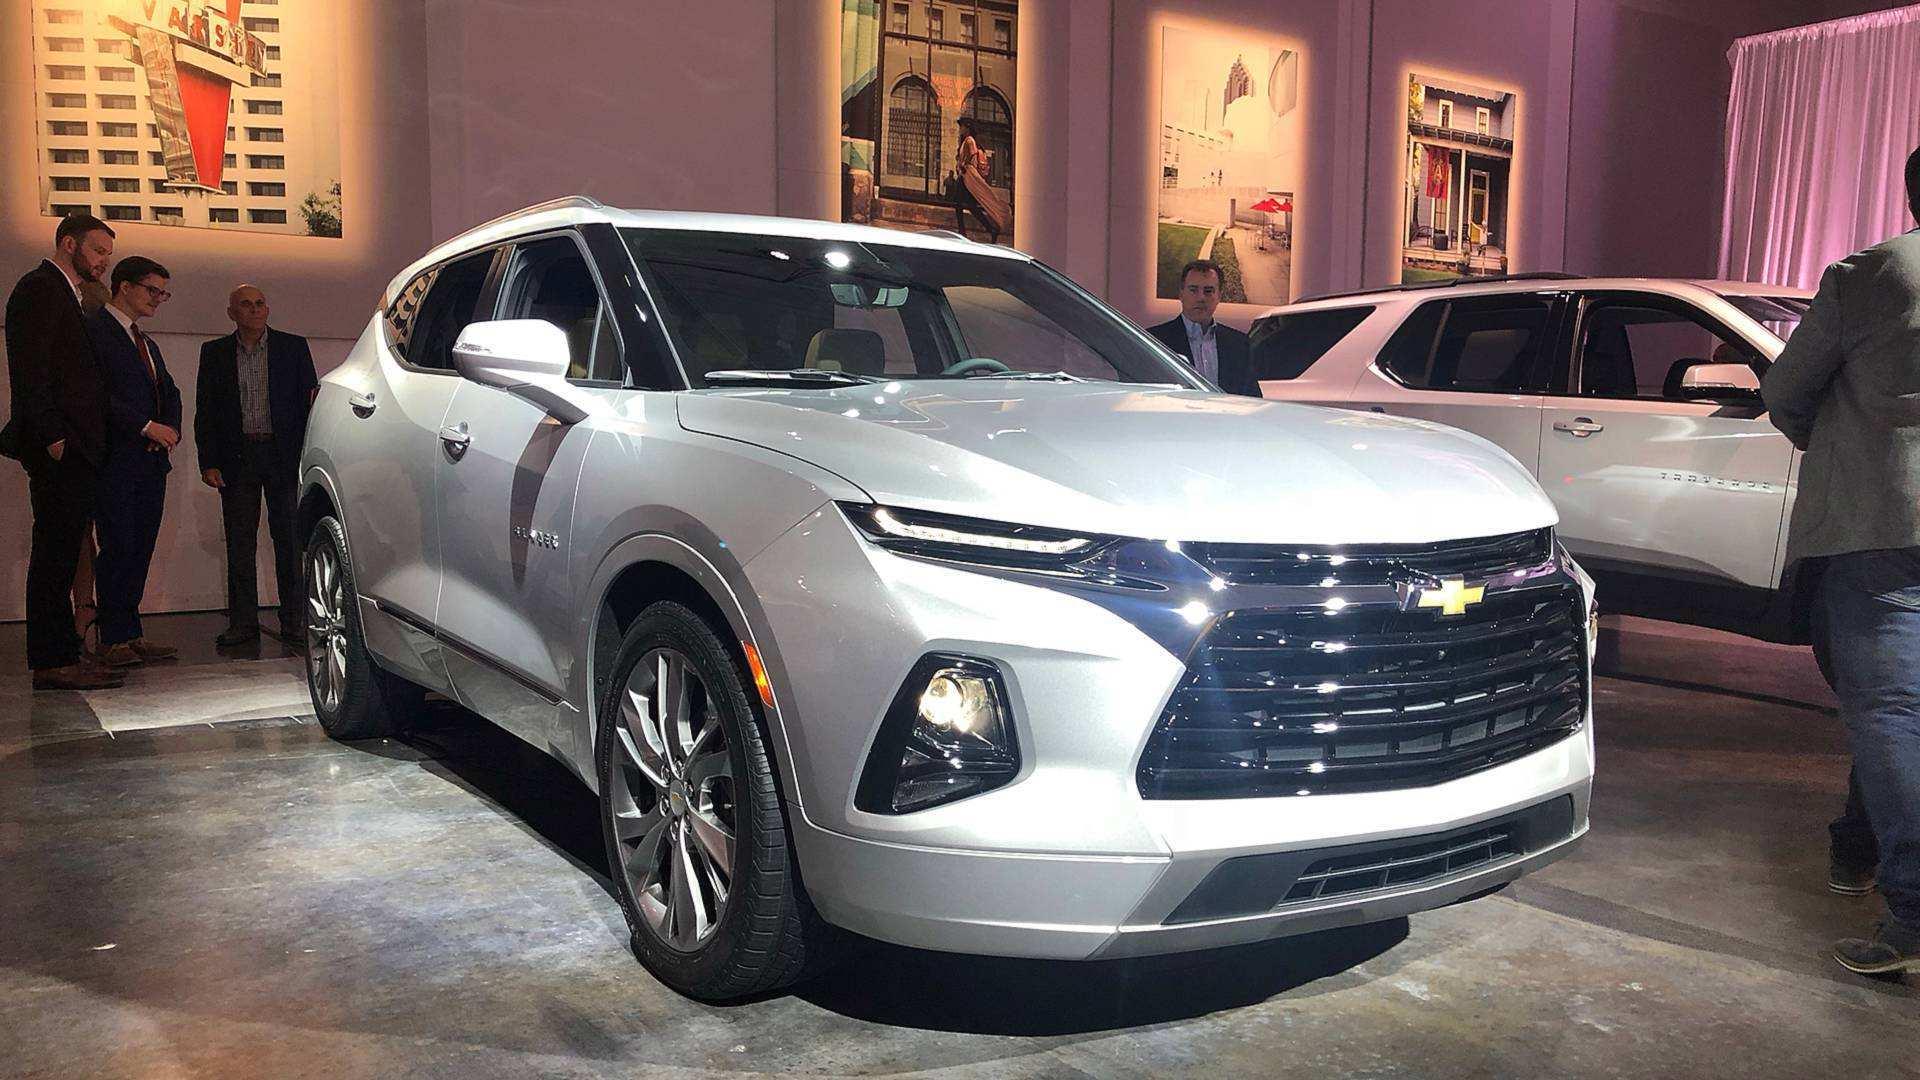 62 Best Review New New Chevrolet 2019 Blazer Engine Redesign by New New Chevrolet 2019 Blazer Engine